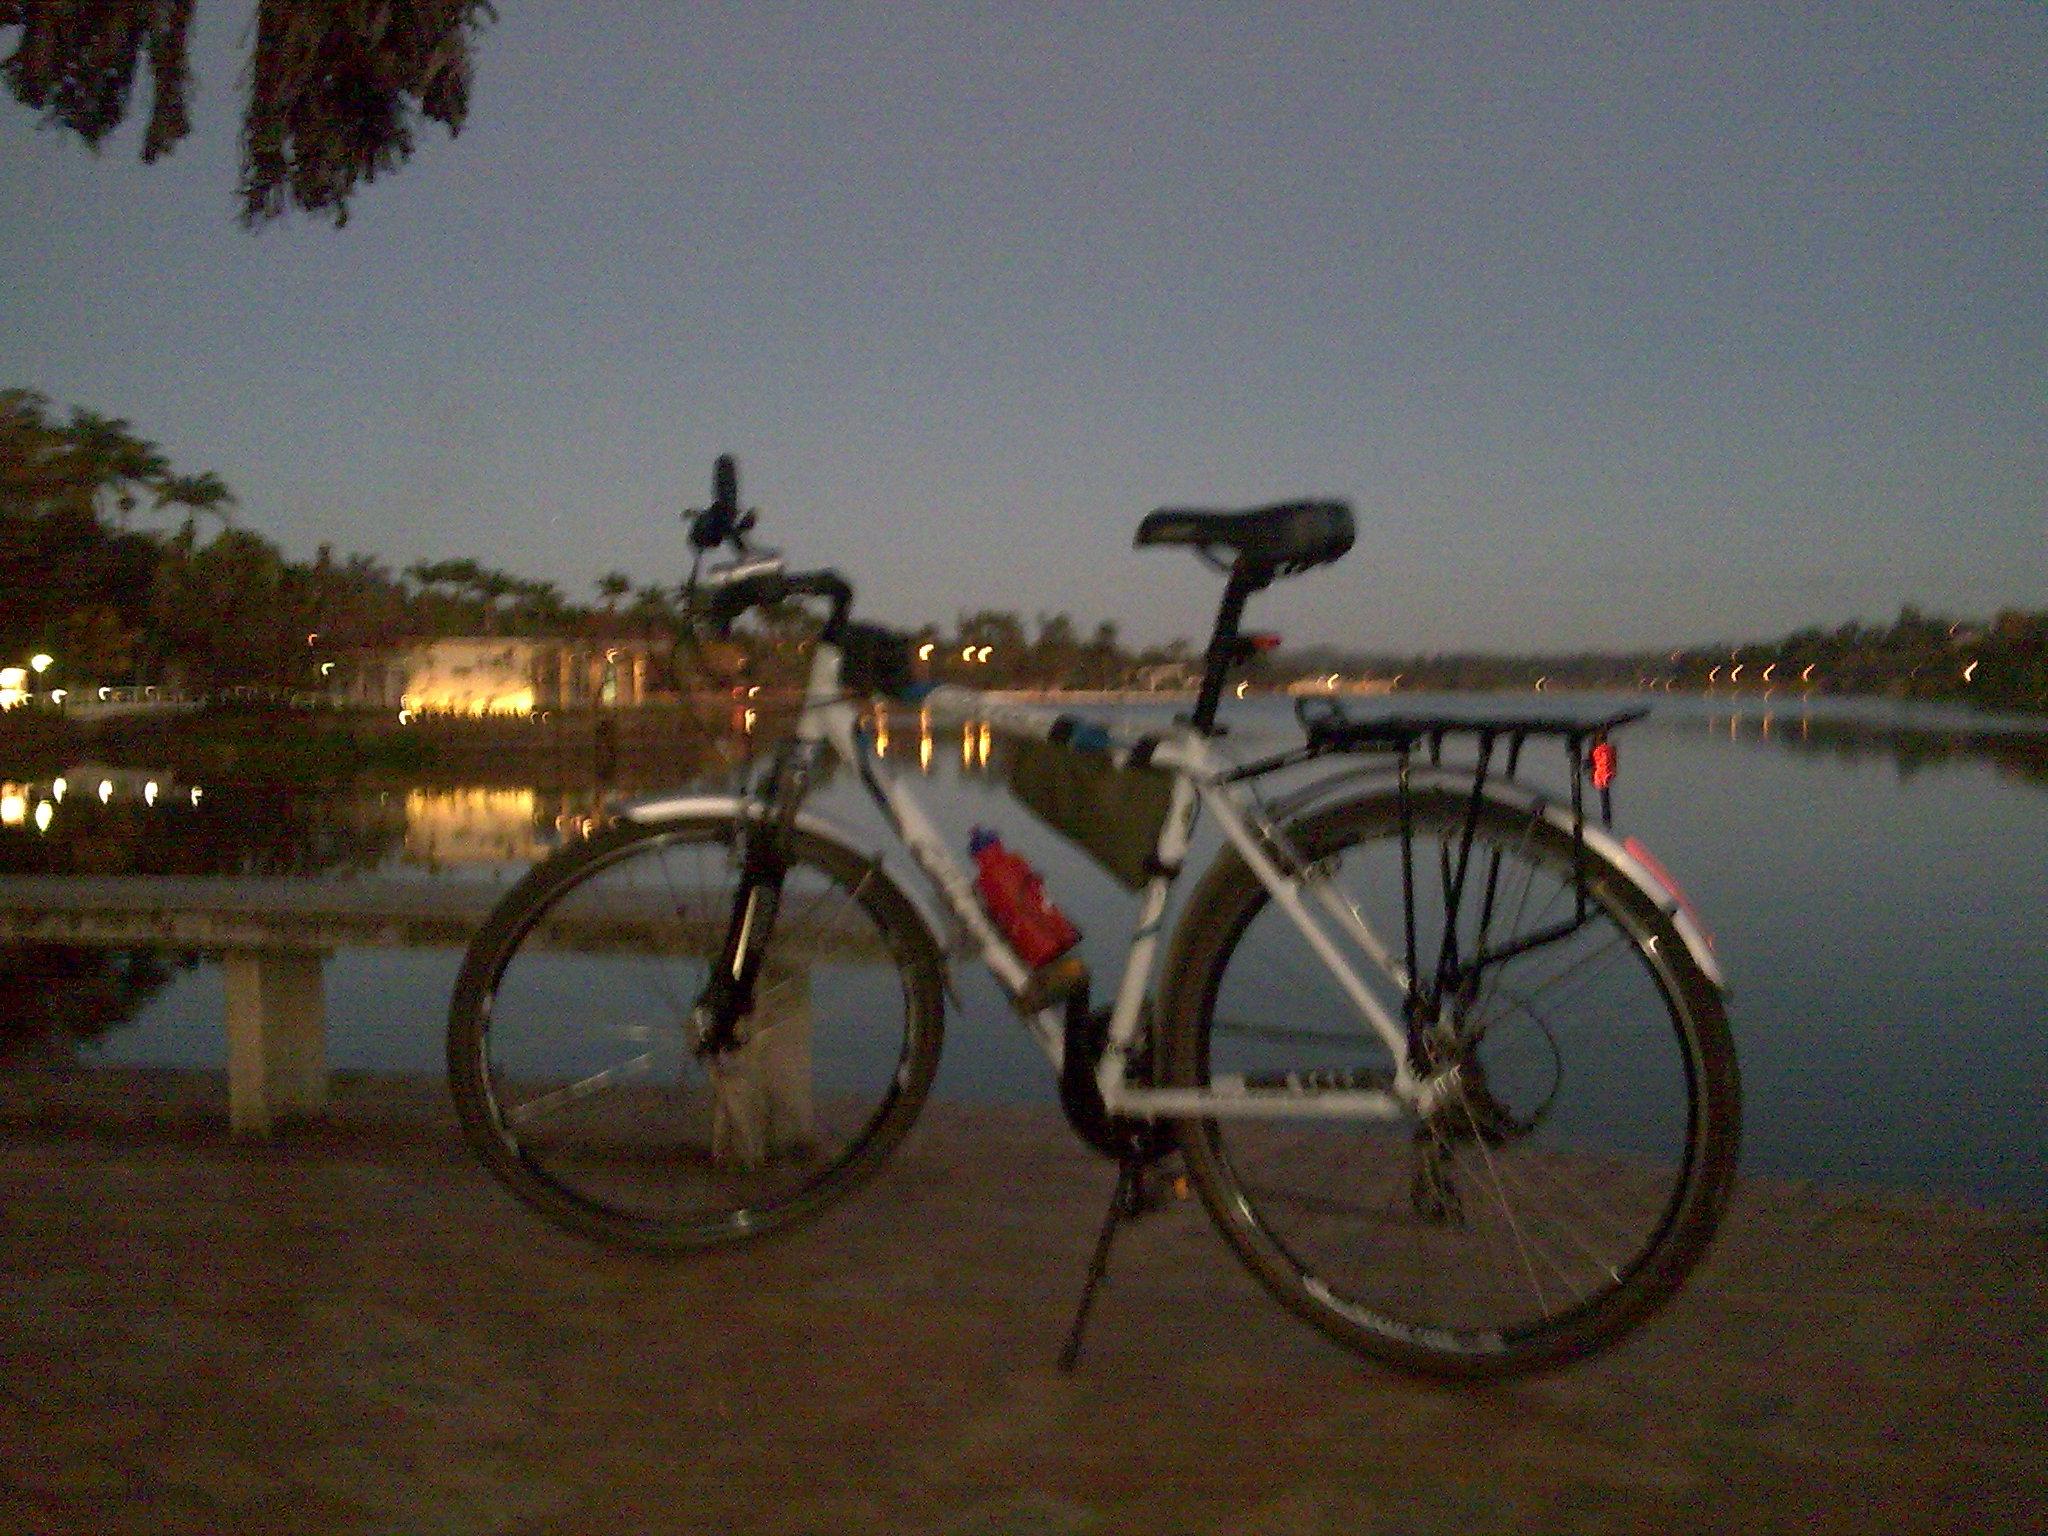 Lagoa da Pampulha hoje, 5:54 da manhã